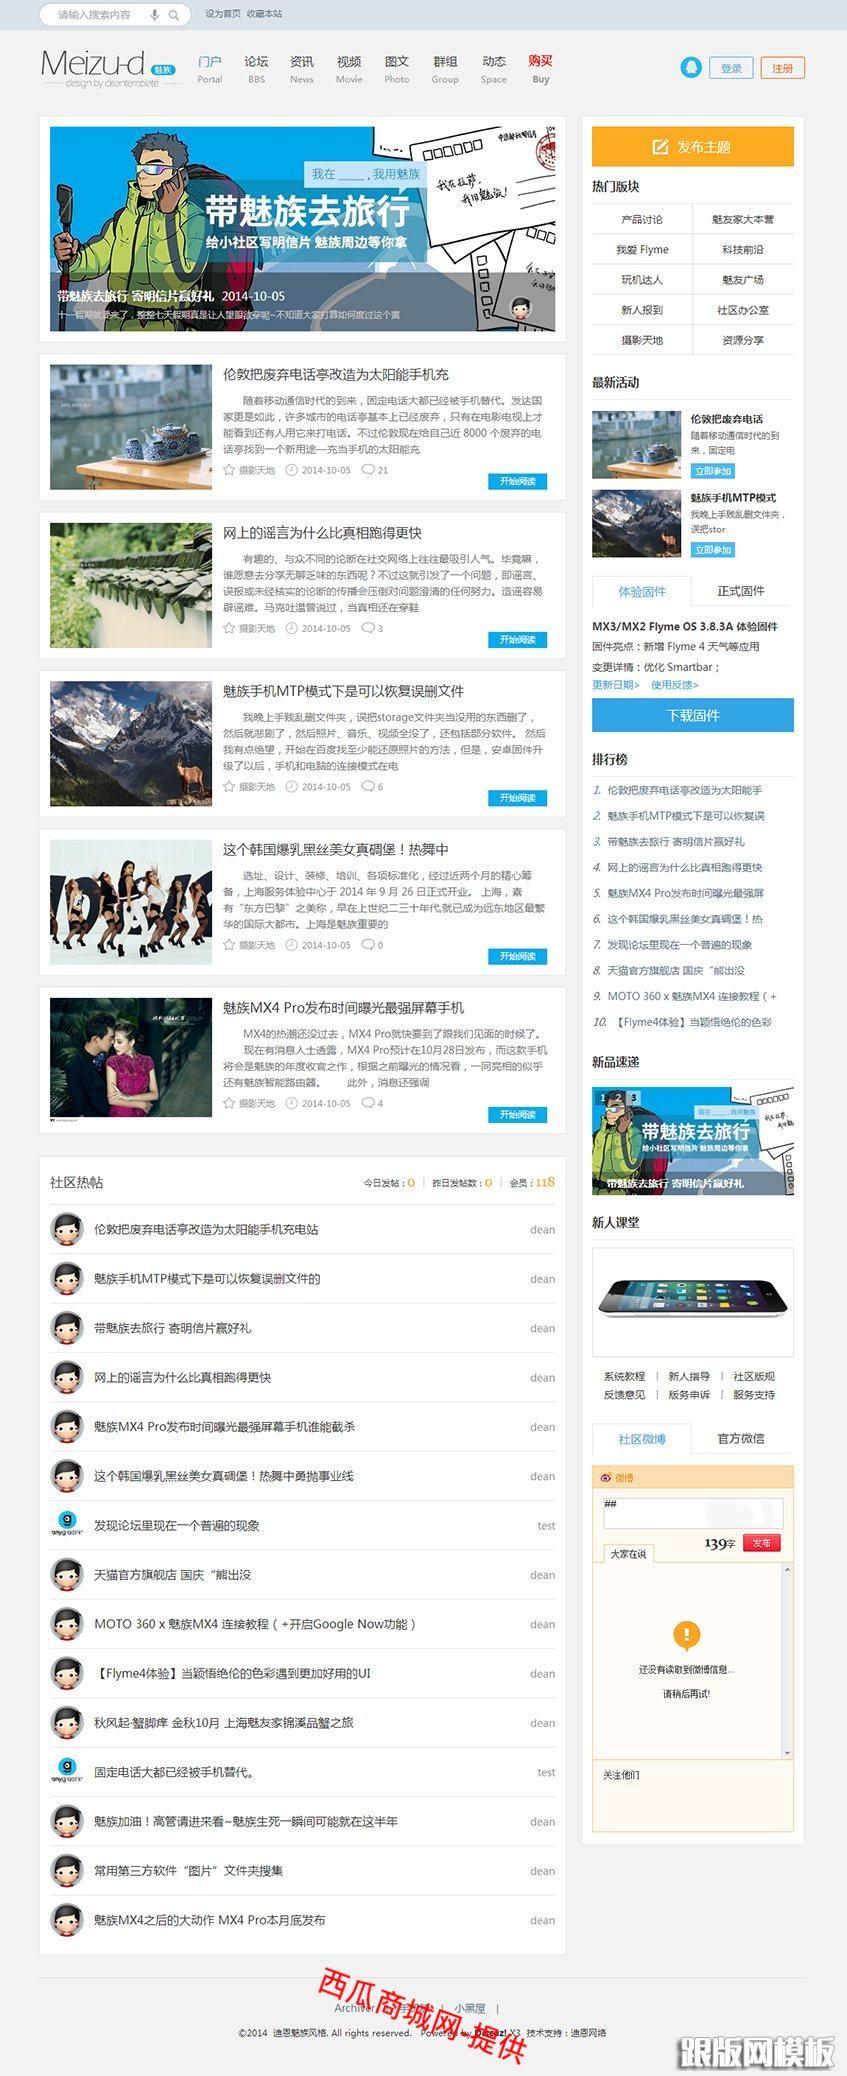 discuz模板迪恩魅族小清新 商业版-可用于做资源网